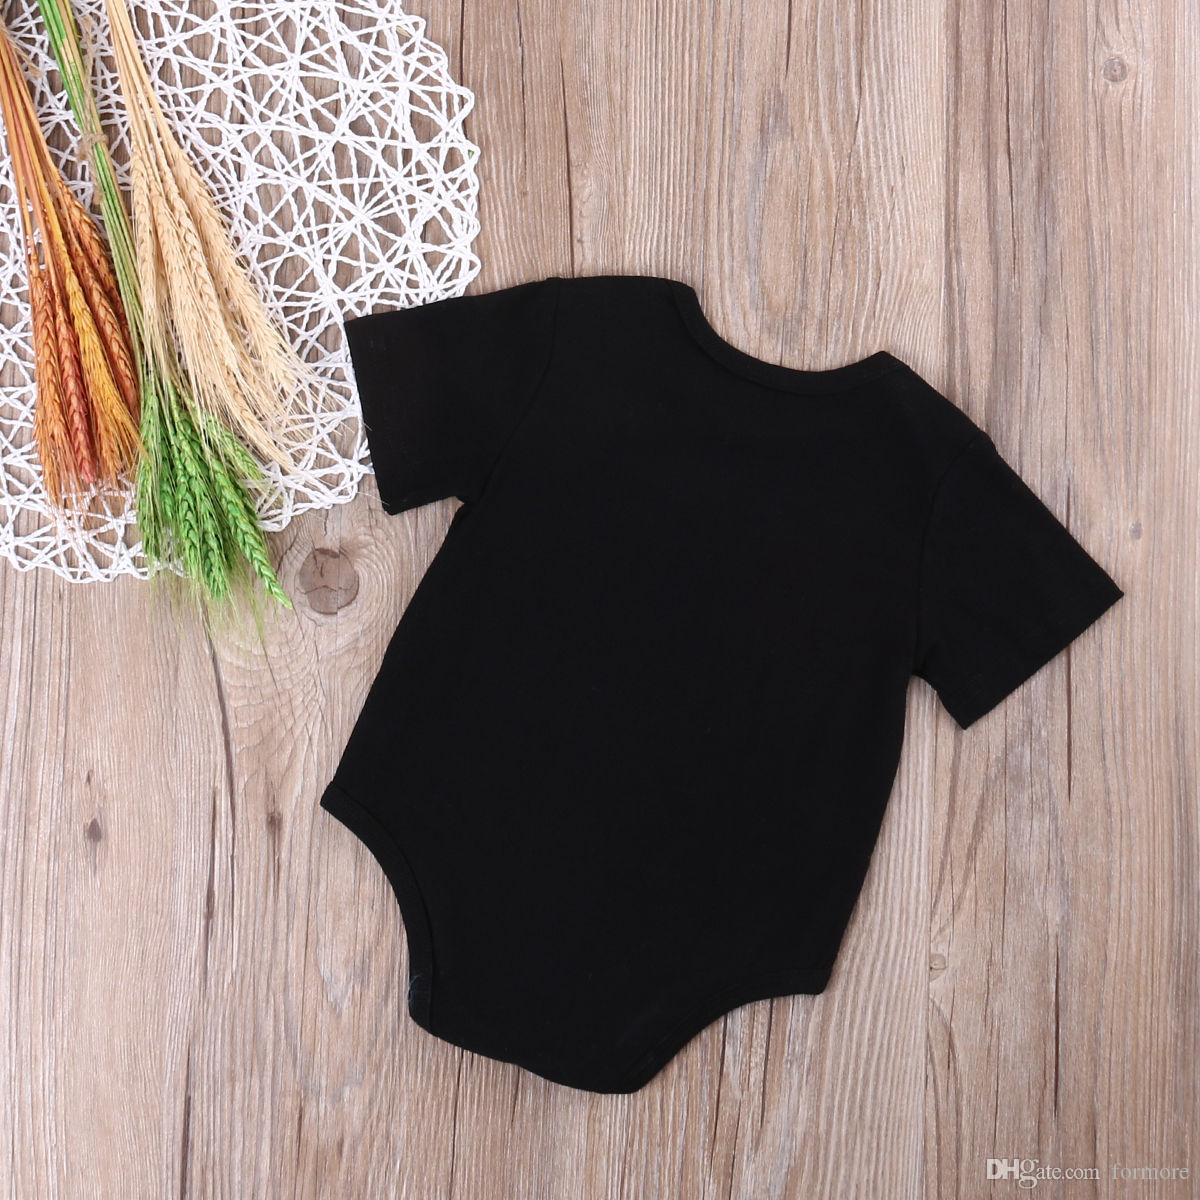 Cute Cotton Baby girl boy Rompers Summer short Sleeve Babies Wear Gift Infant Jumpsuit Girls Clothes Roupas De Bebe Infantil for toddlers